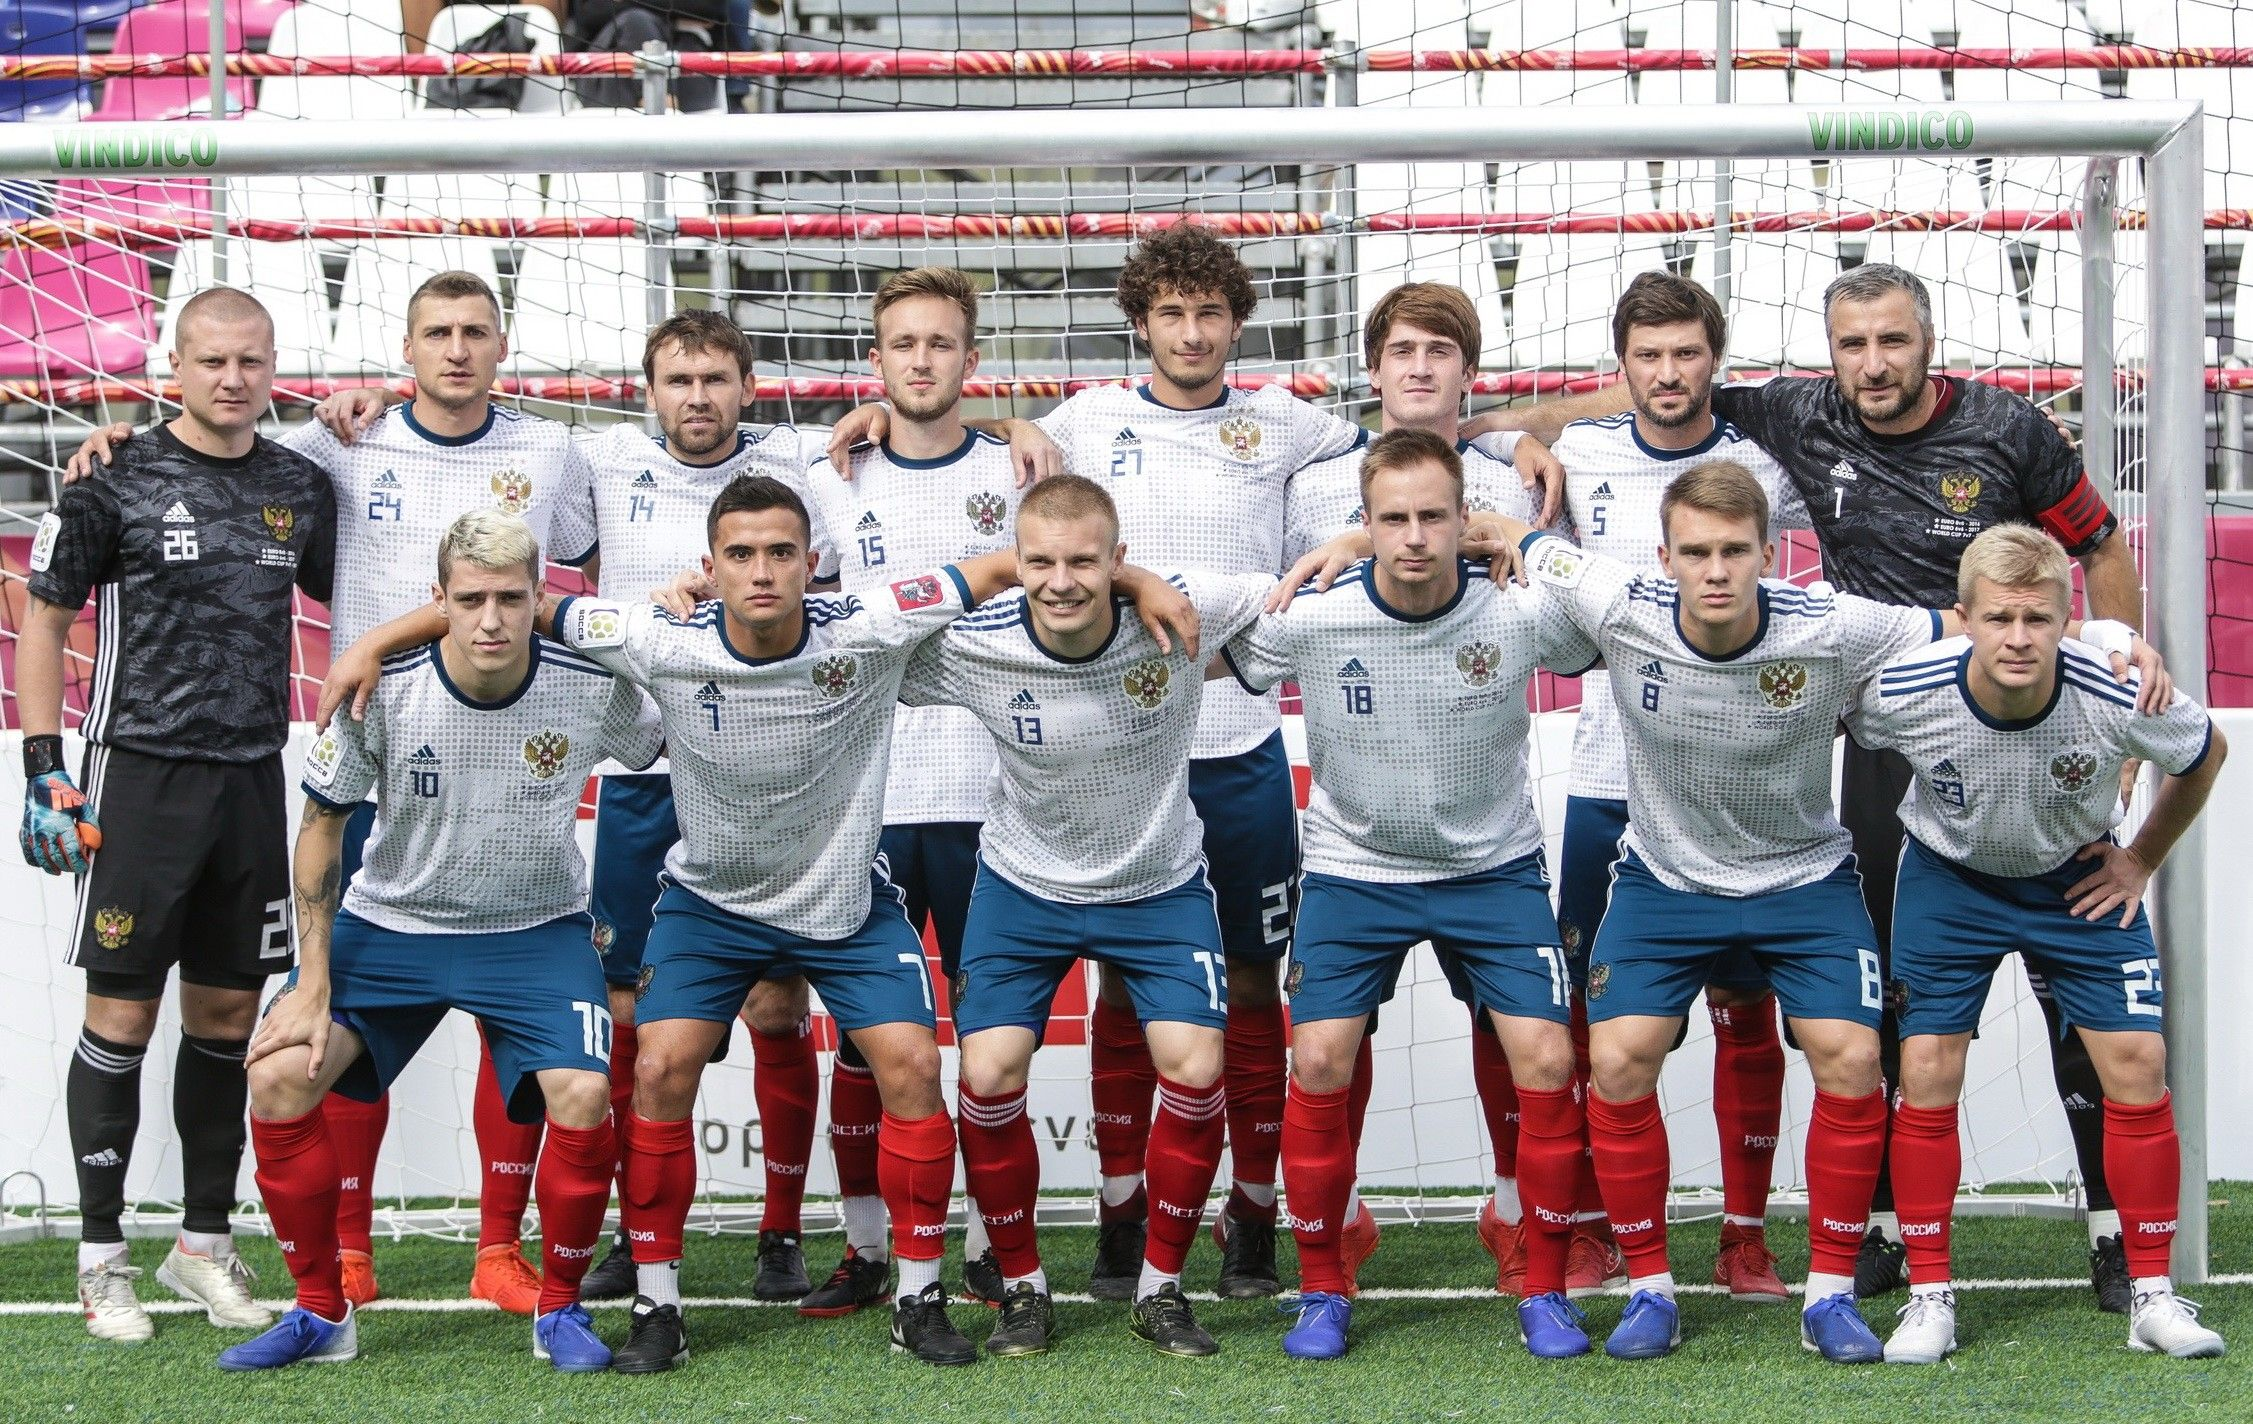 Footballers from Gazprom Transgaz Stavropol win world